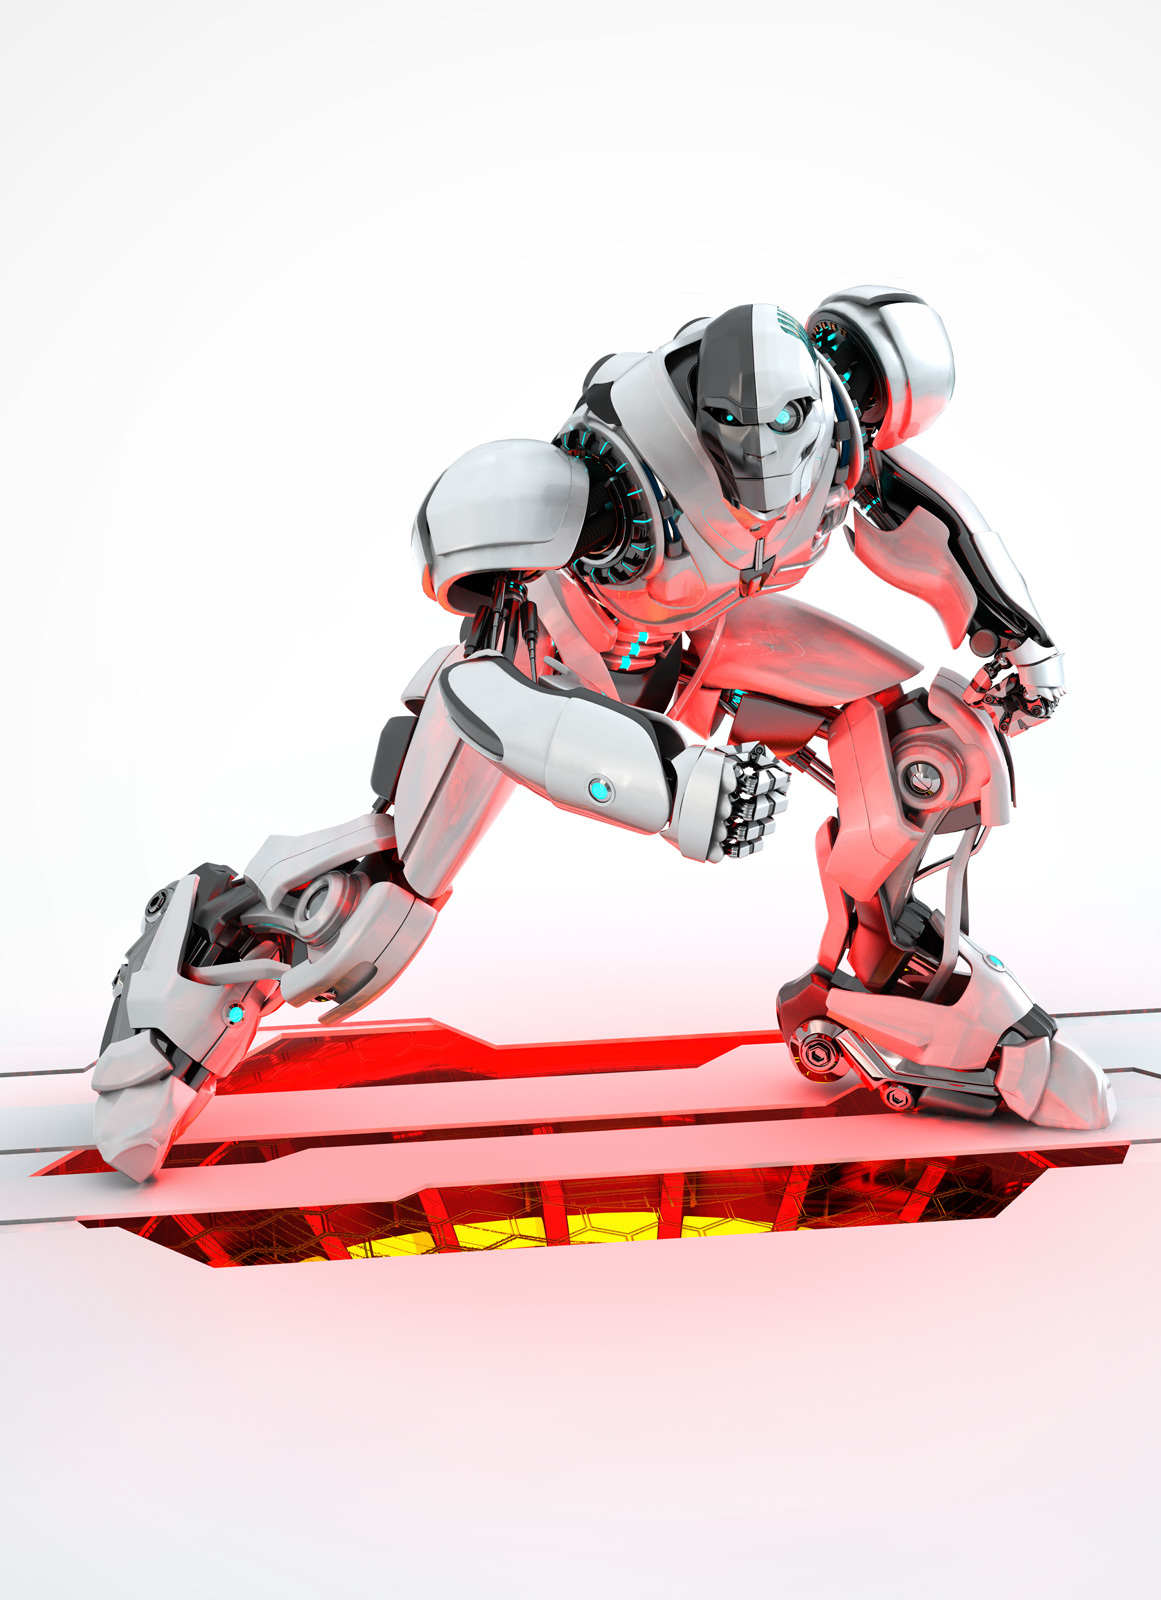 Xidon cyborg illuminate 1 a3f94273 ibmg